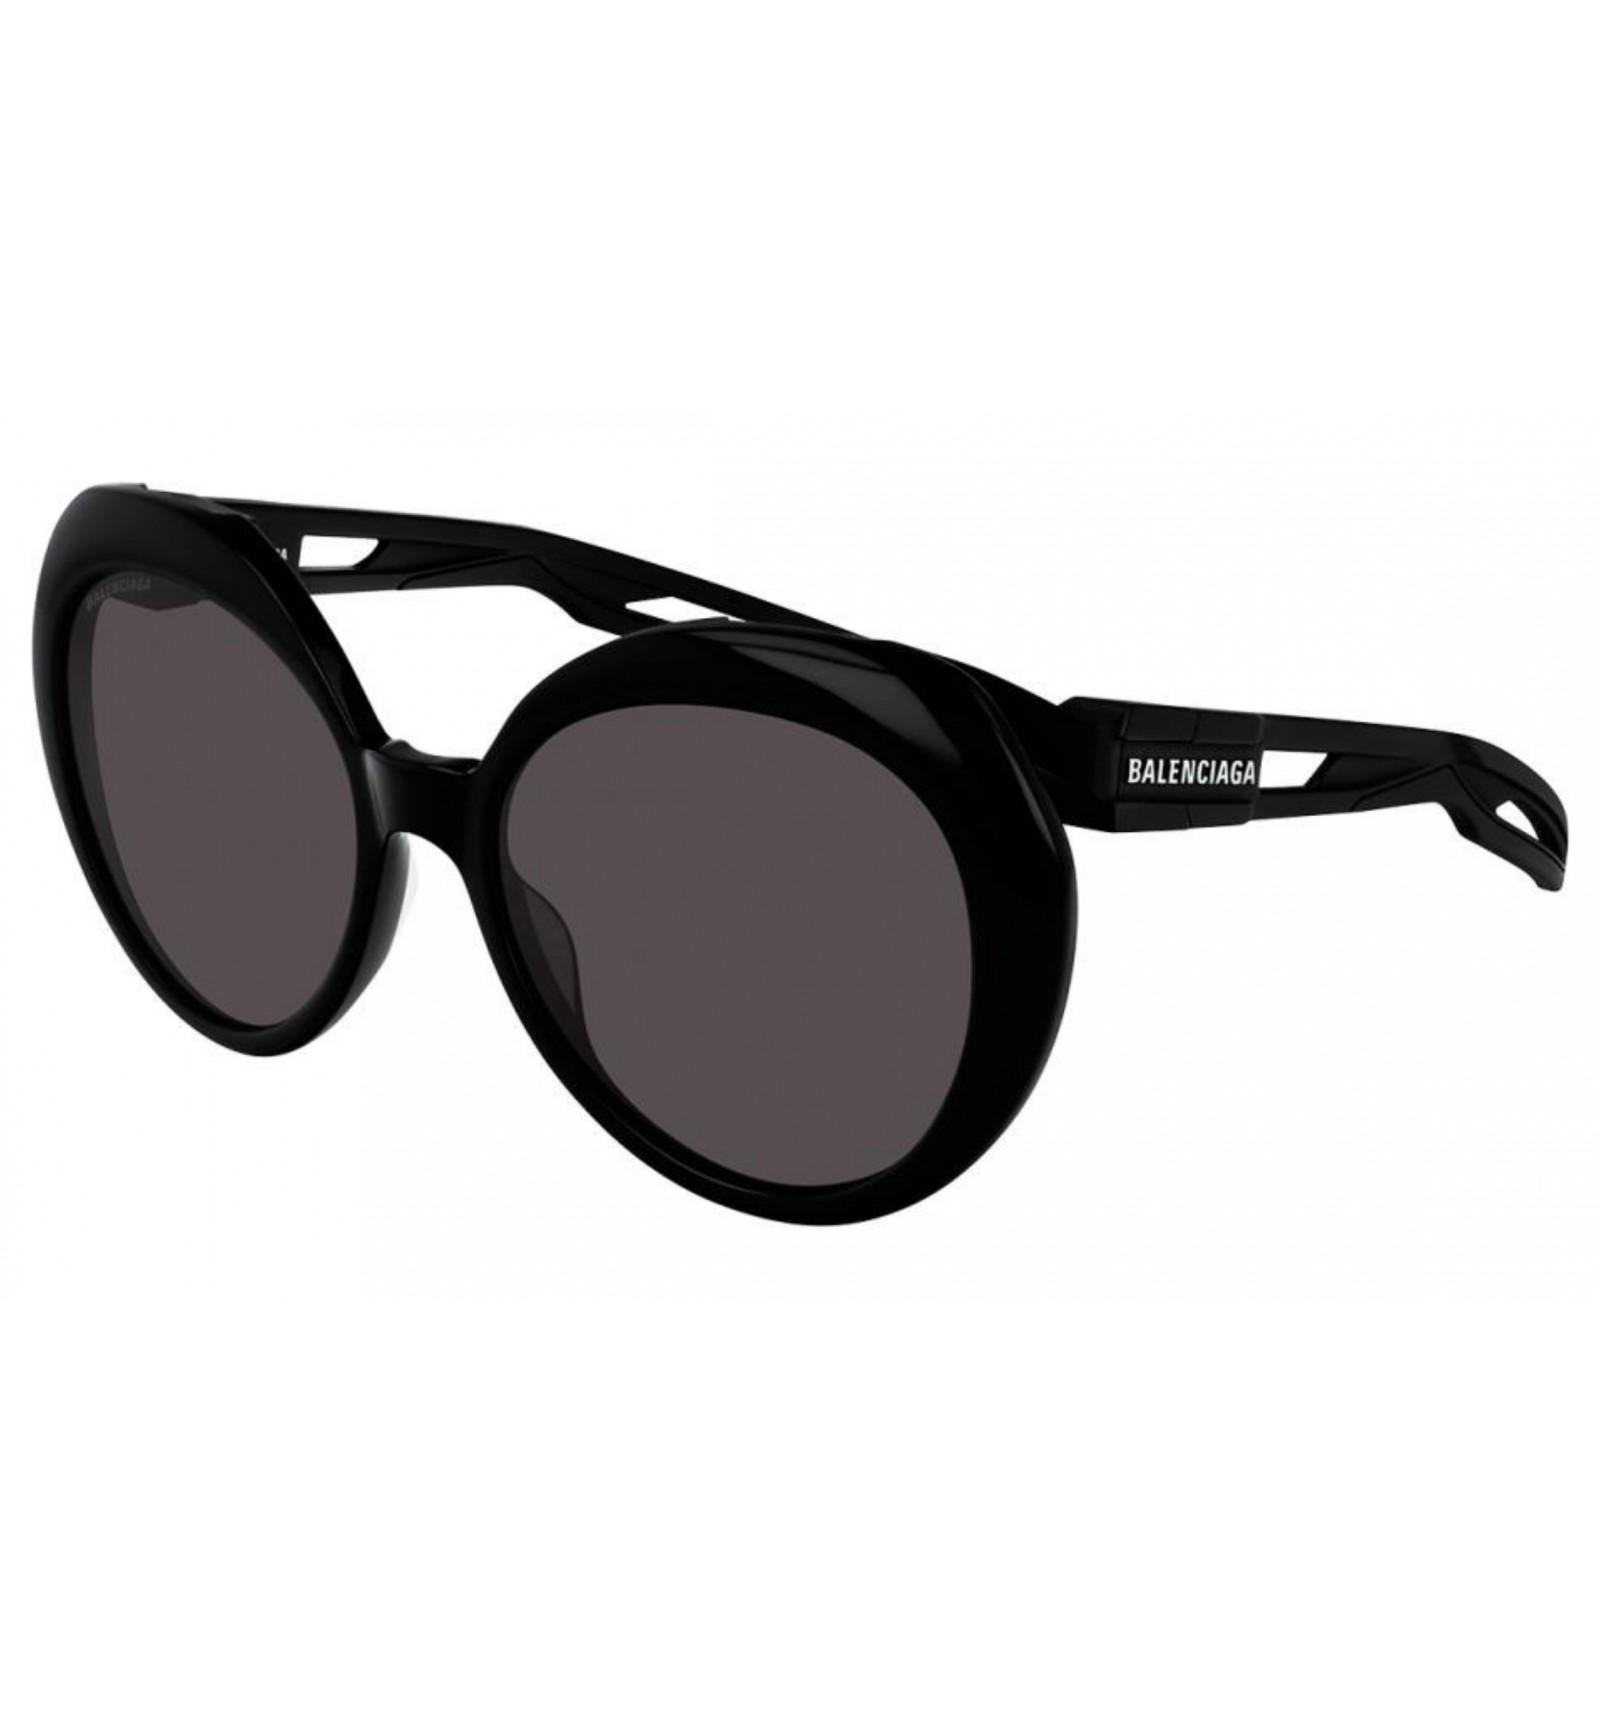 diseño de calidad d5a40 017e3 Gafas de sol Balenciaga BB0024 Negro - Gris (004)